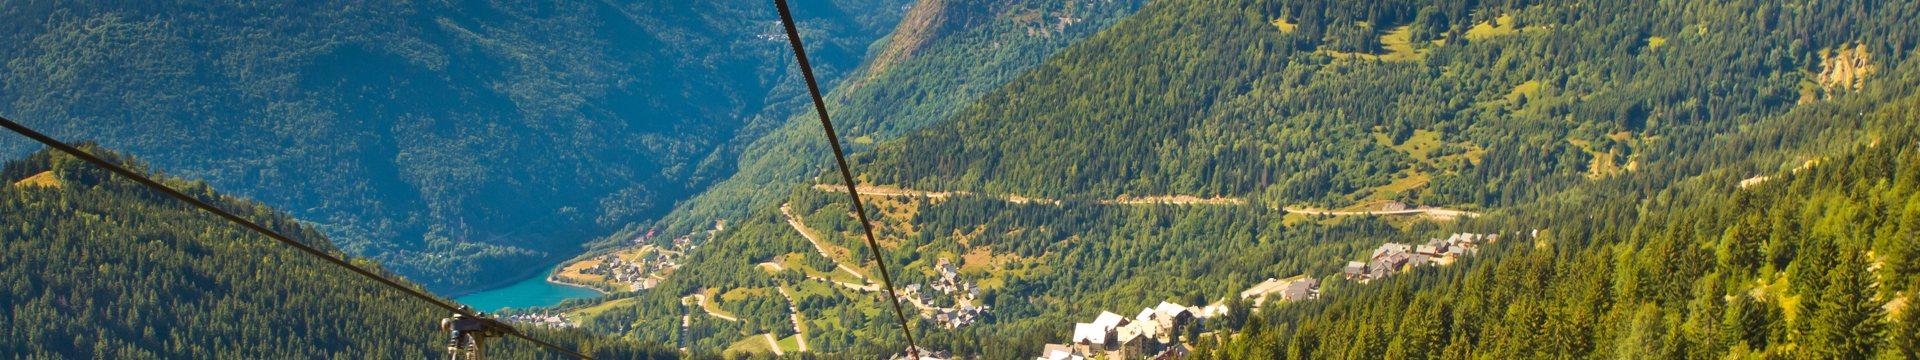 Alpe d'Huez Grand Domaine